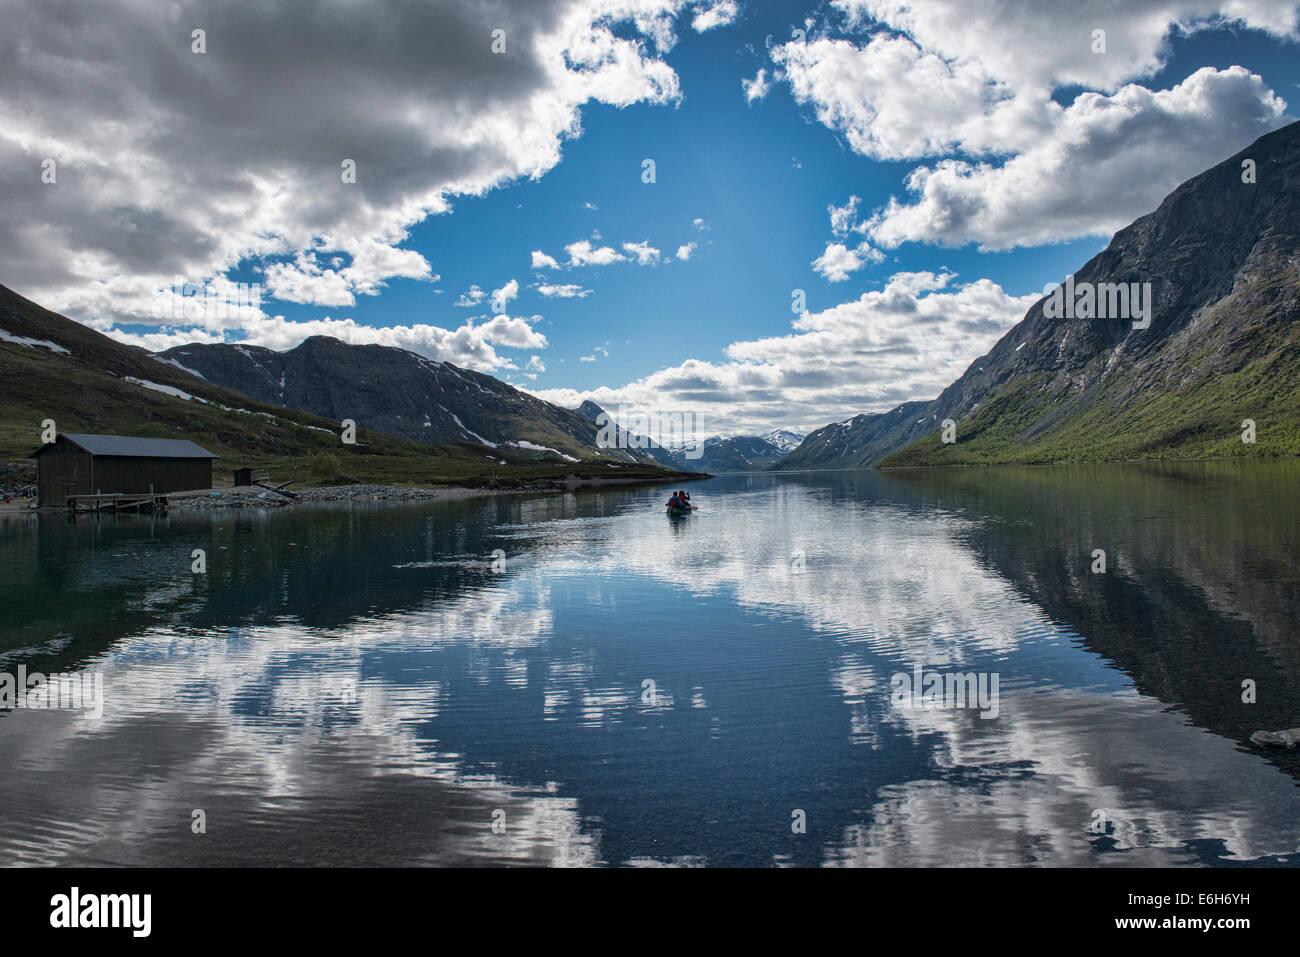 canoeing in Jotunheimen National Park, Norway - Stock Image